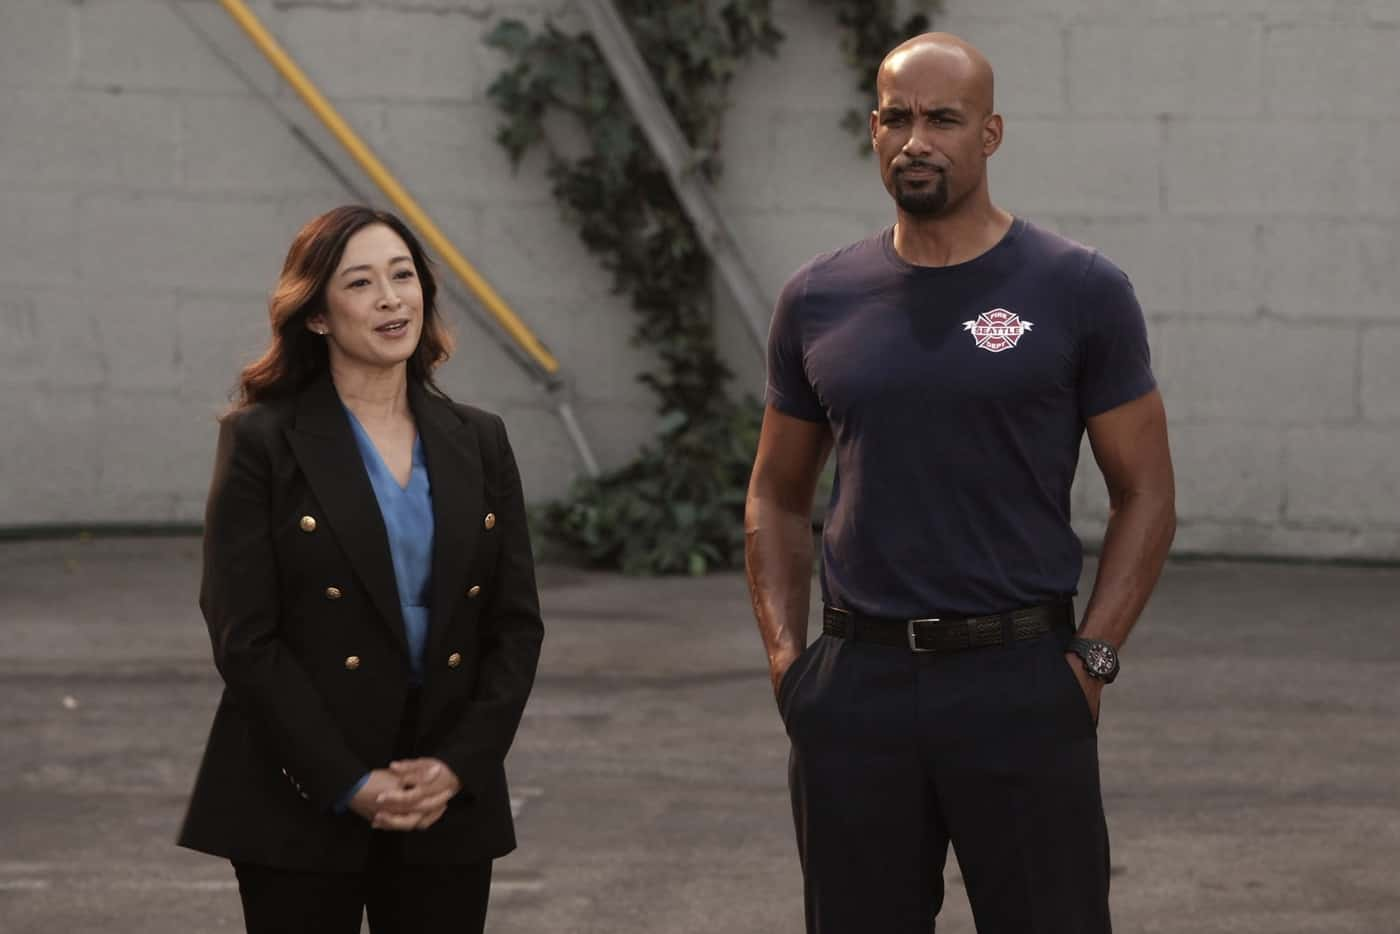 STATION 19 Season 5 Episode 3 Photos Too Darn Hot